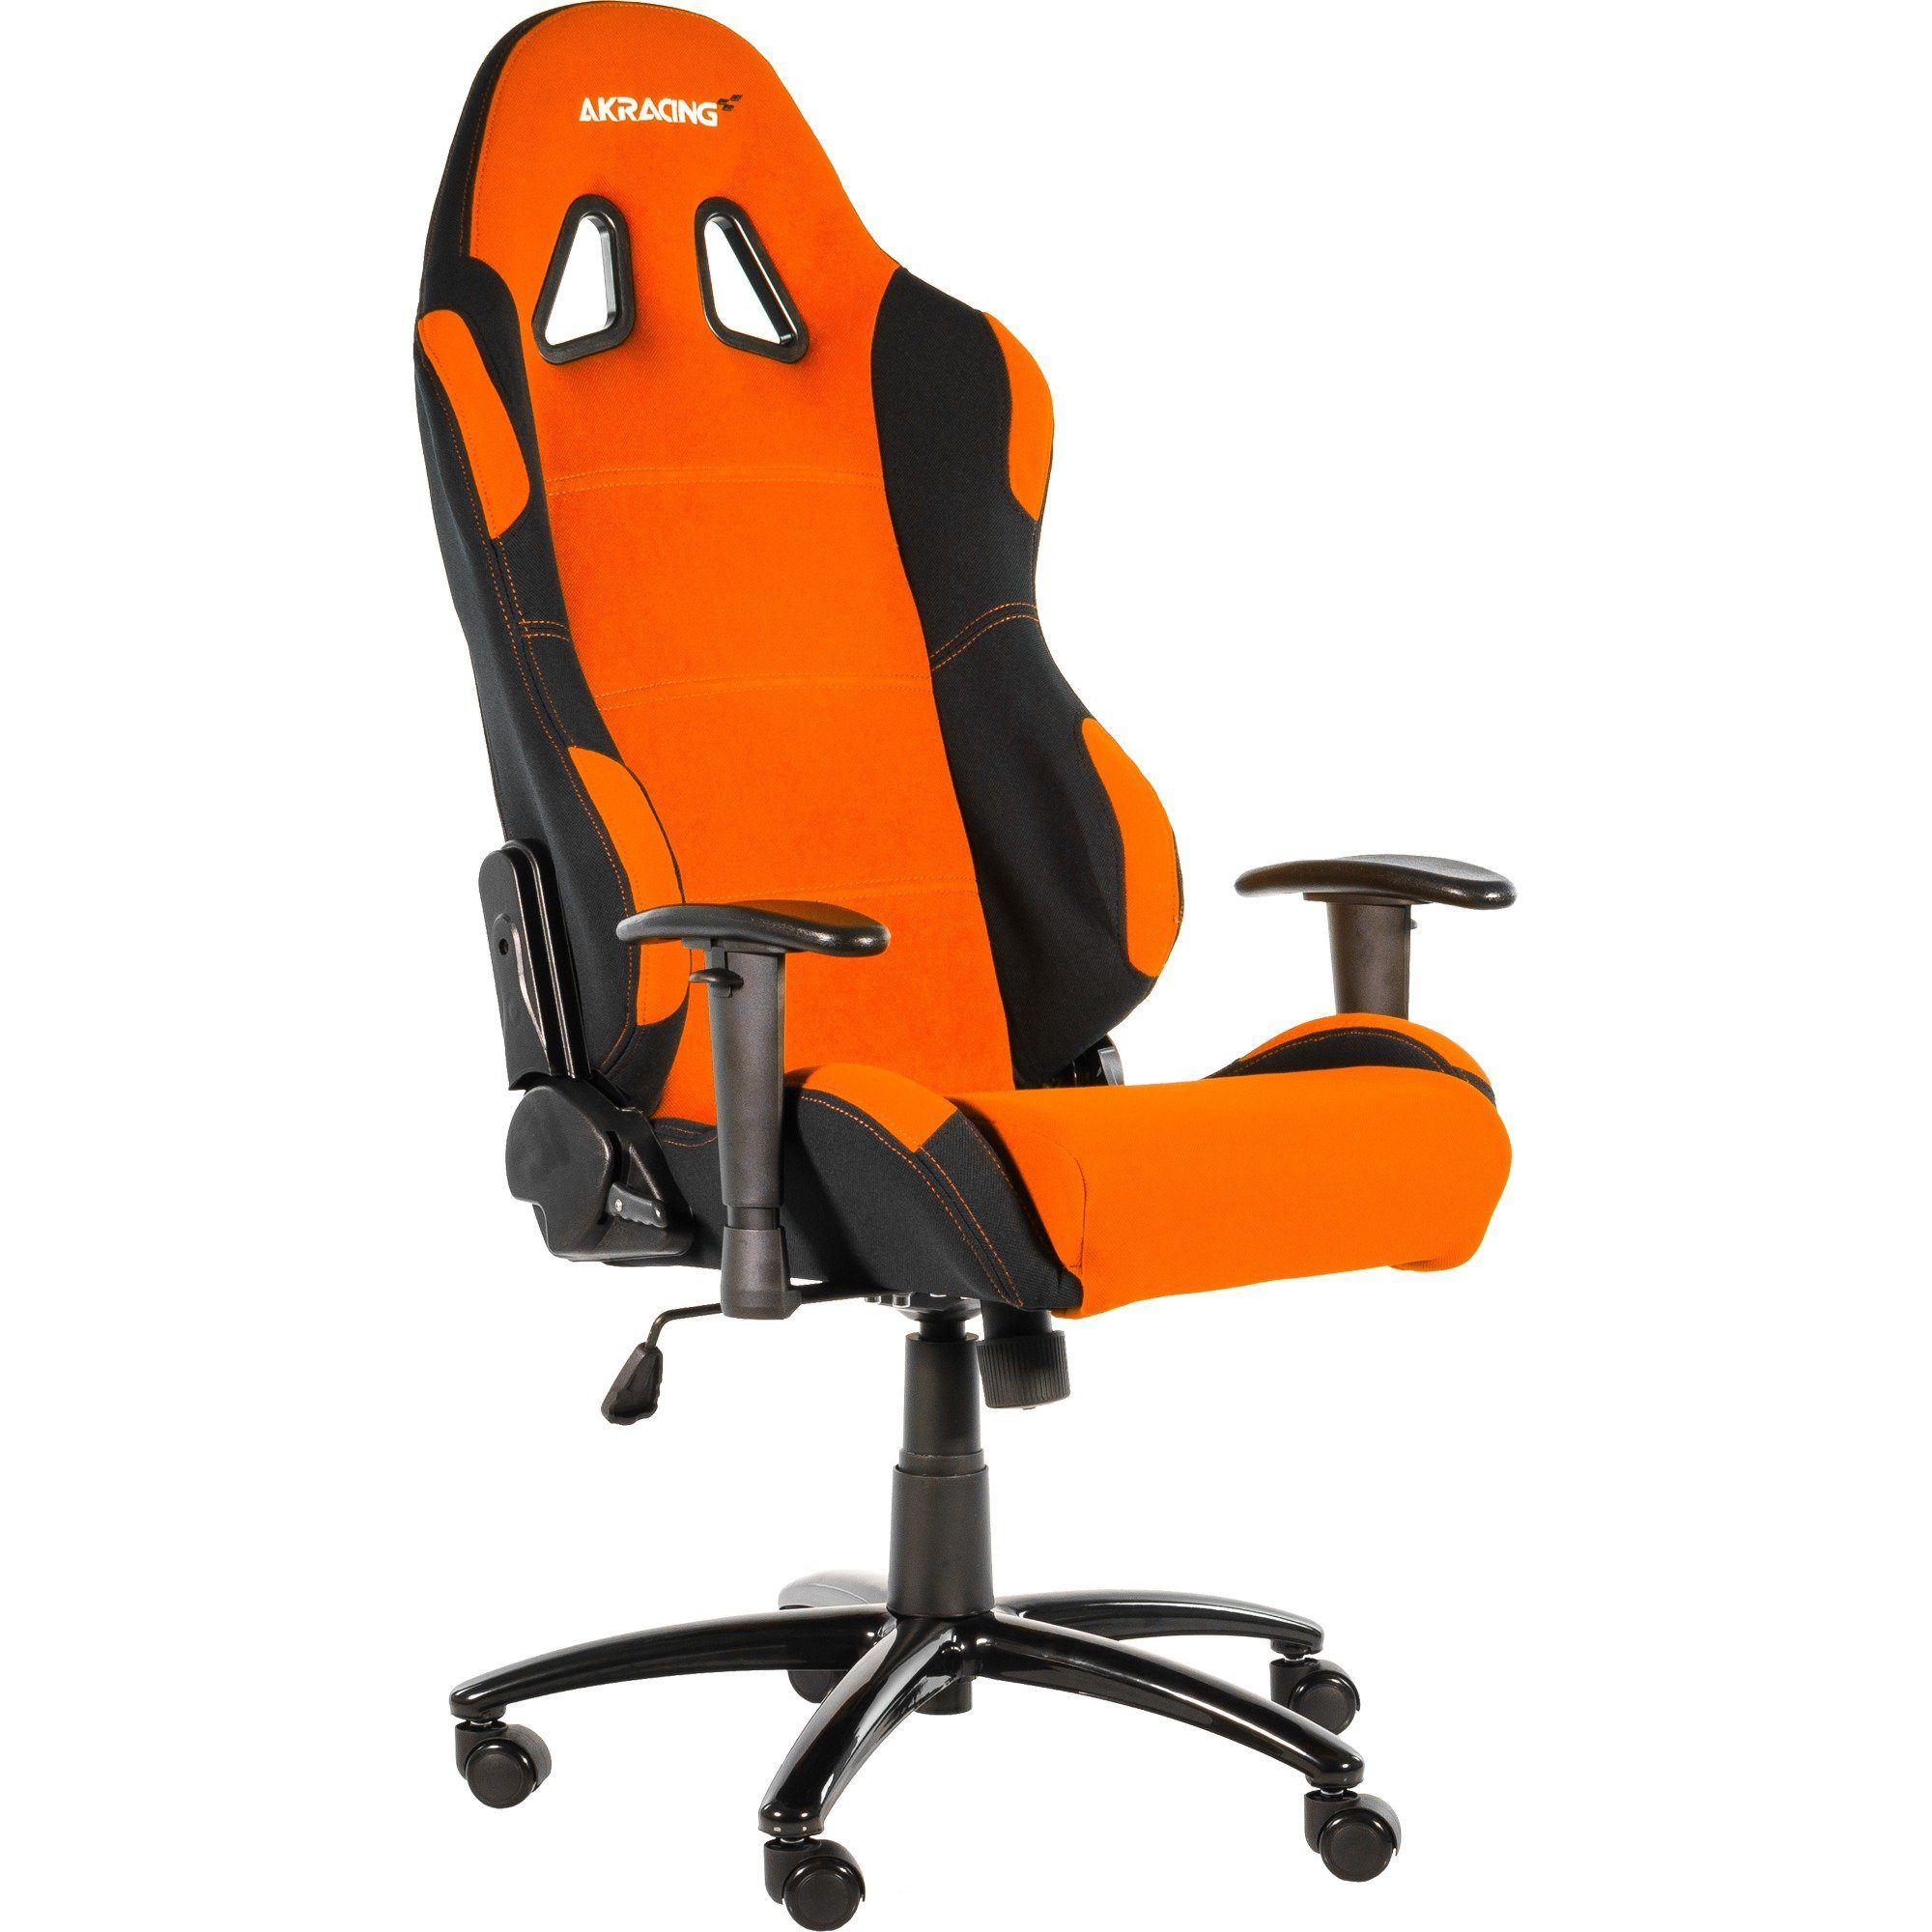 AKRACING Spielsitz »Prime Gaming Chair«